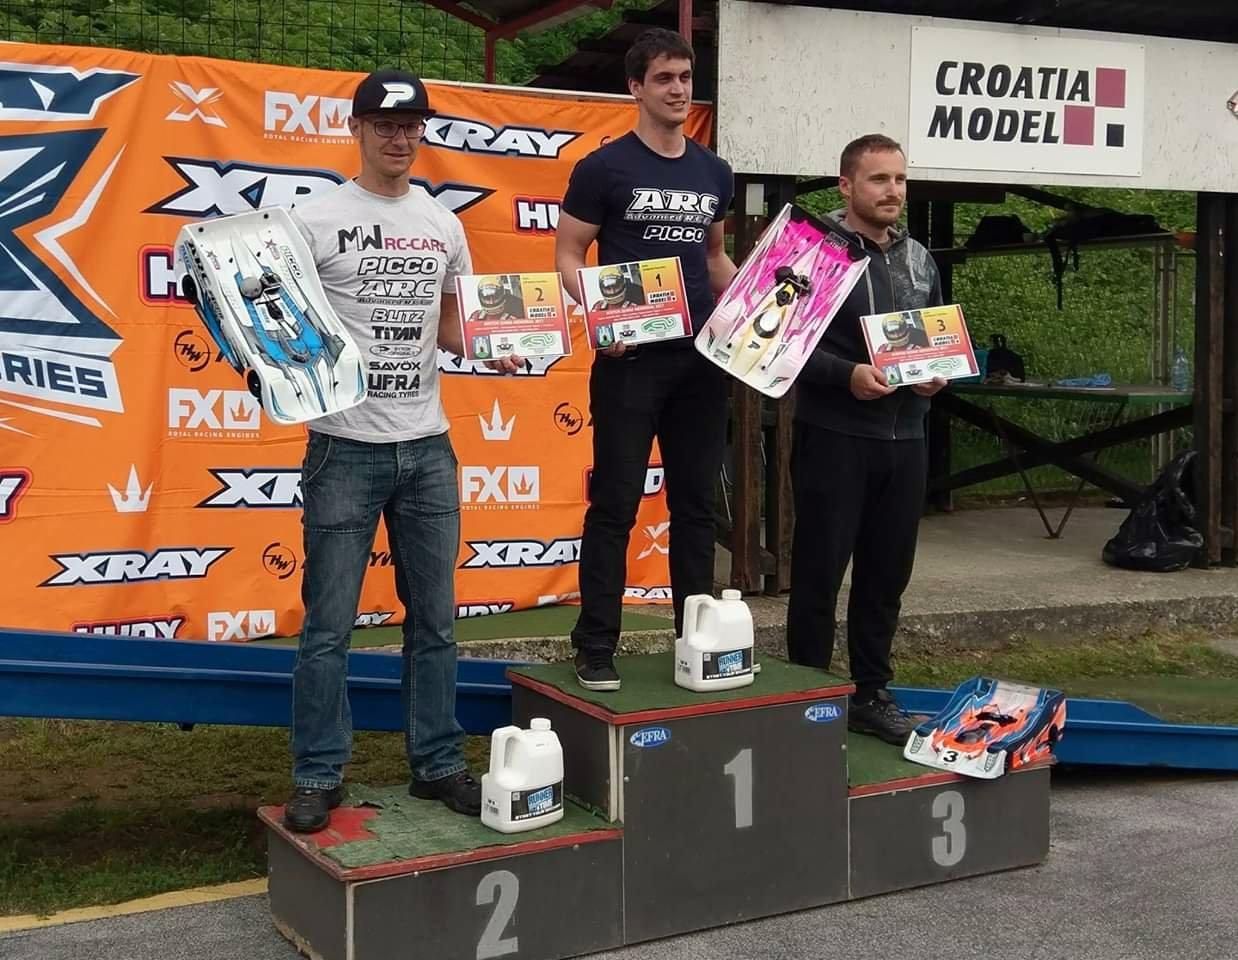 XRS Lauf 2017 Zagreb